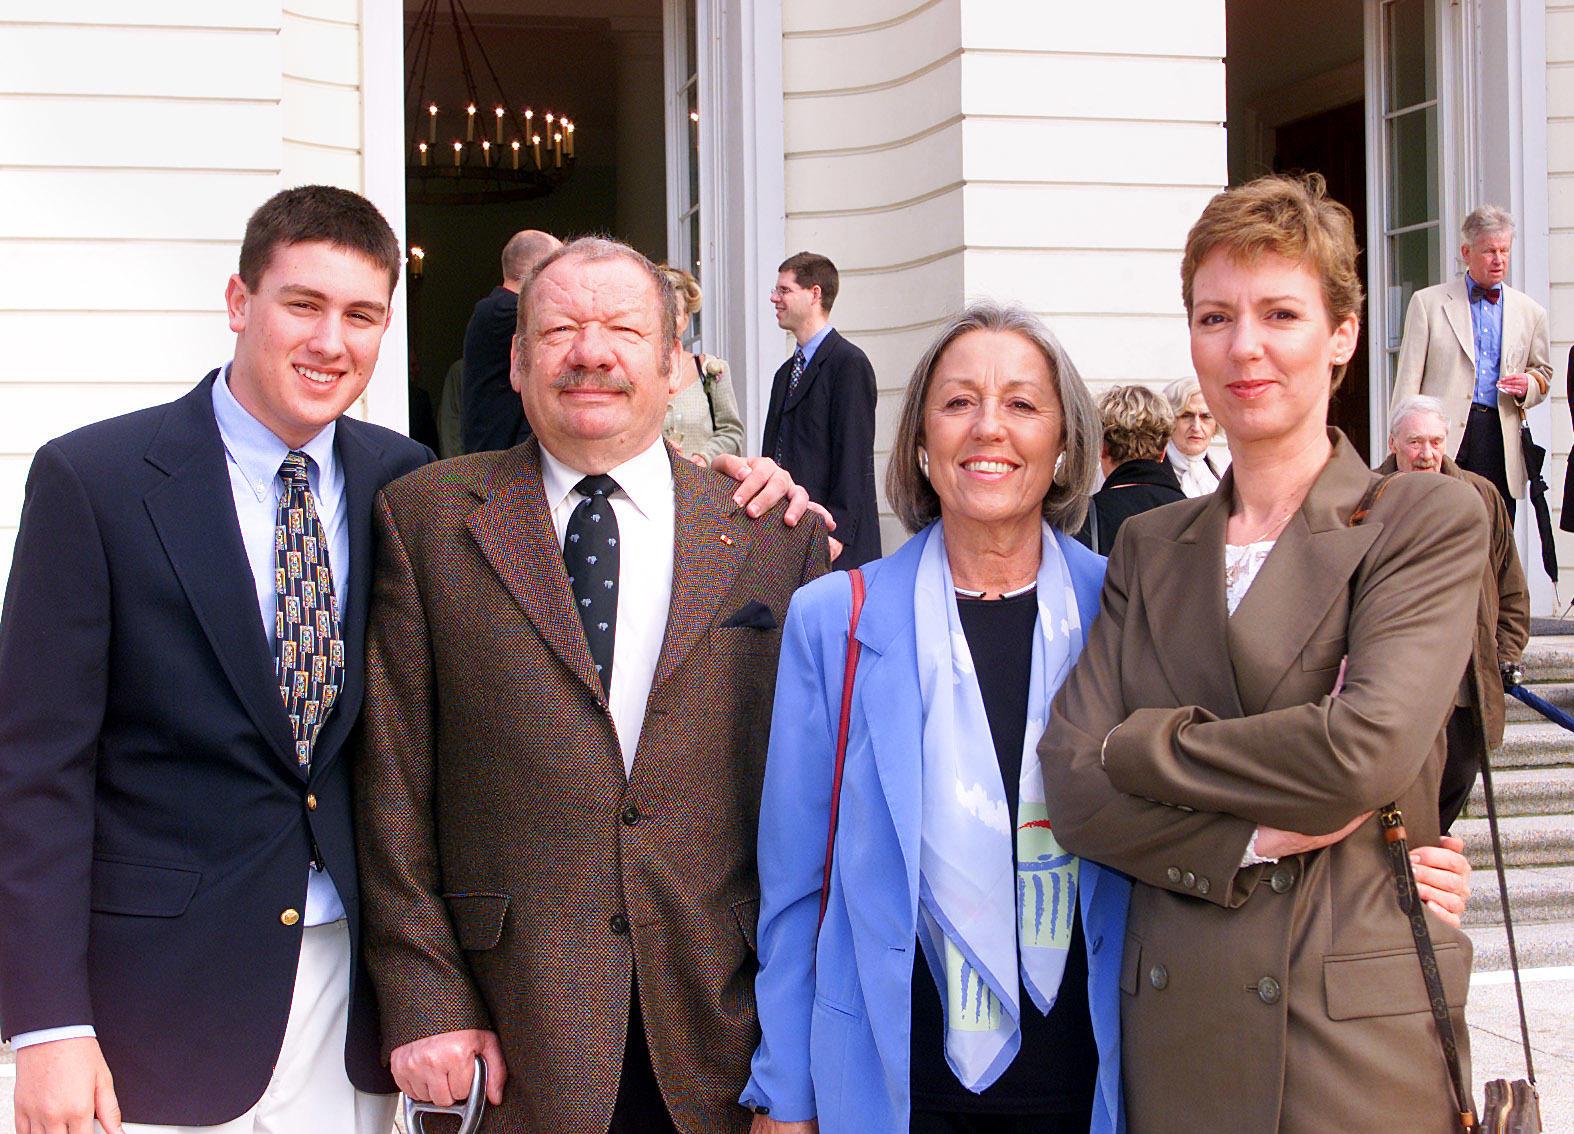 Teenie Daniel Völz mit Opa Wolfgang Völz, Oma Roswitha Völz und Mama Rebecca Völz (v.l.n.r.) 2000 in Berlin.